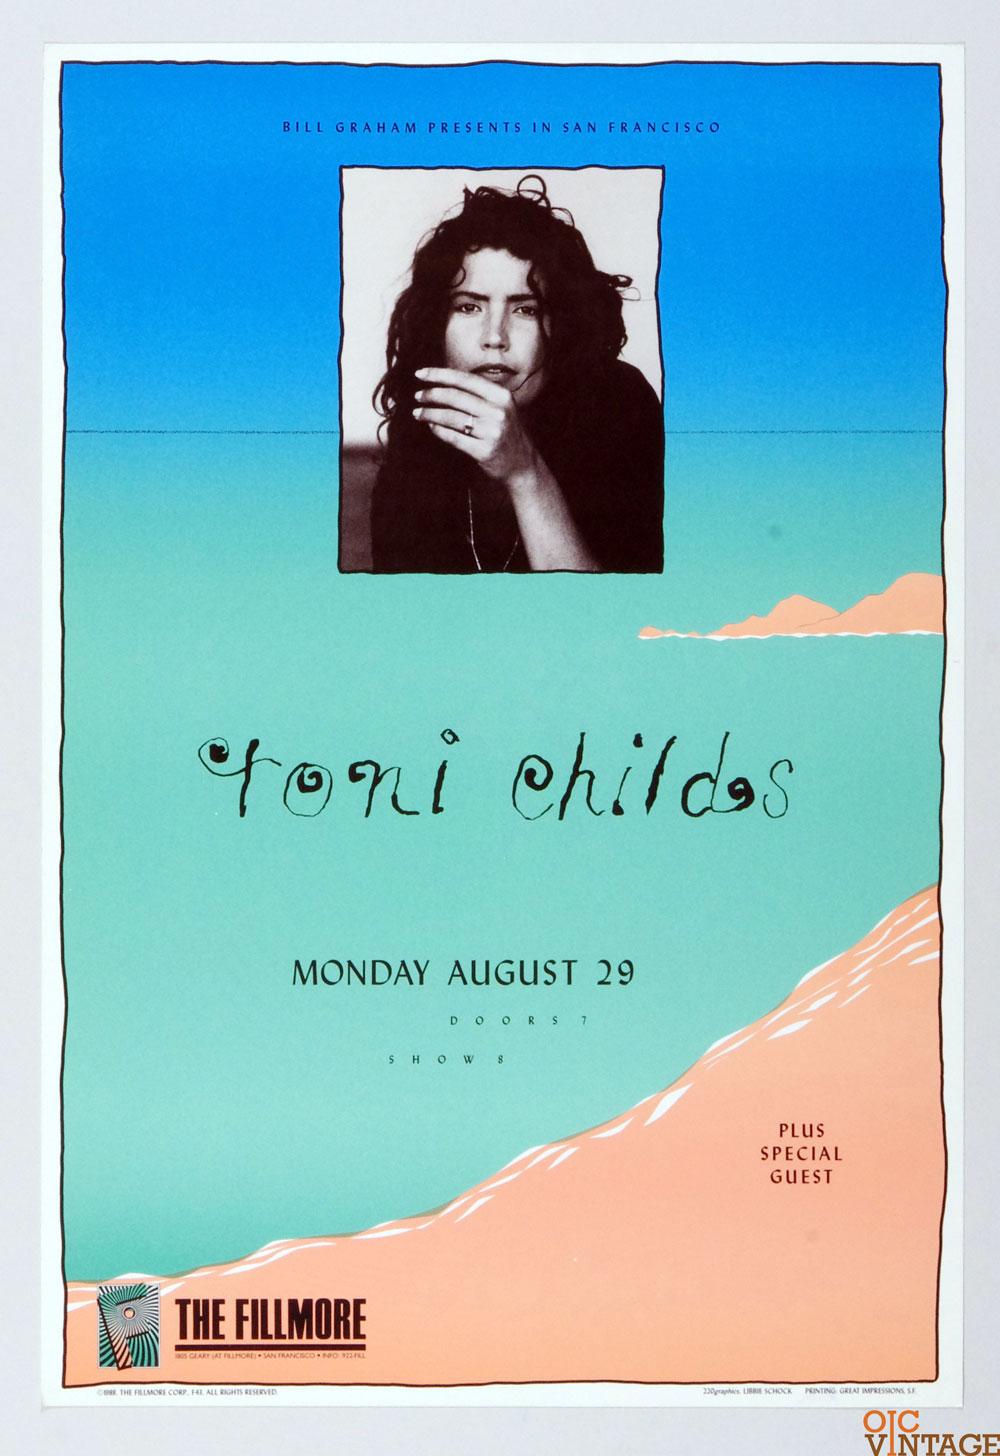 New Fillmore F043 Poster Toni Childs 1988 Aug 29